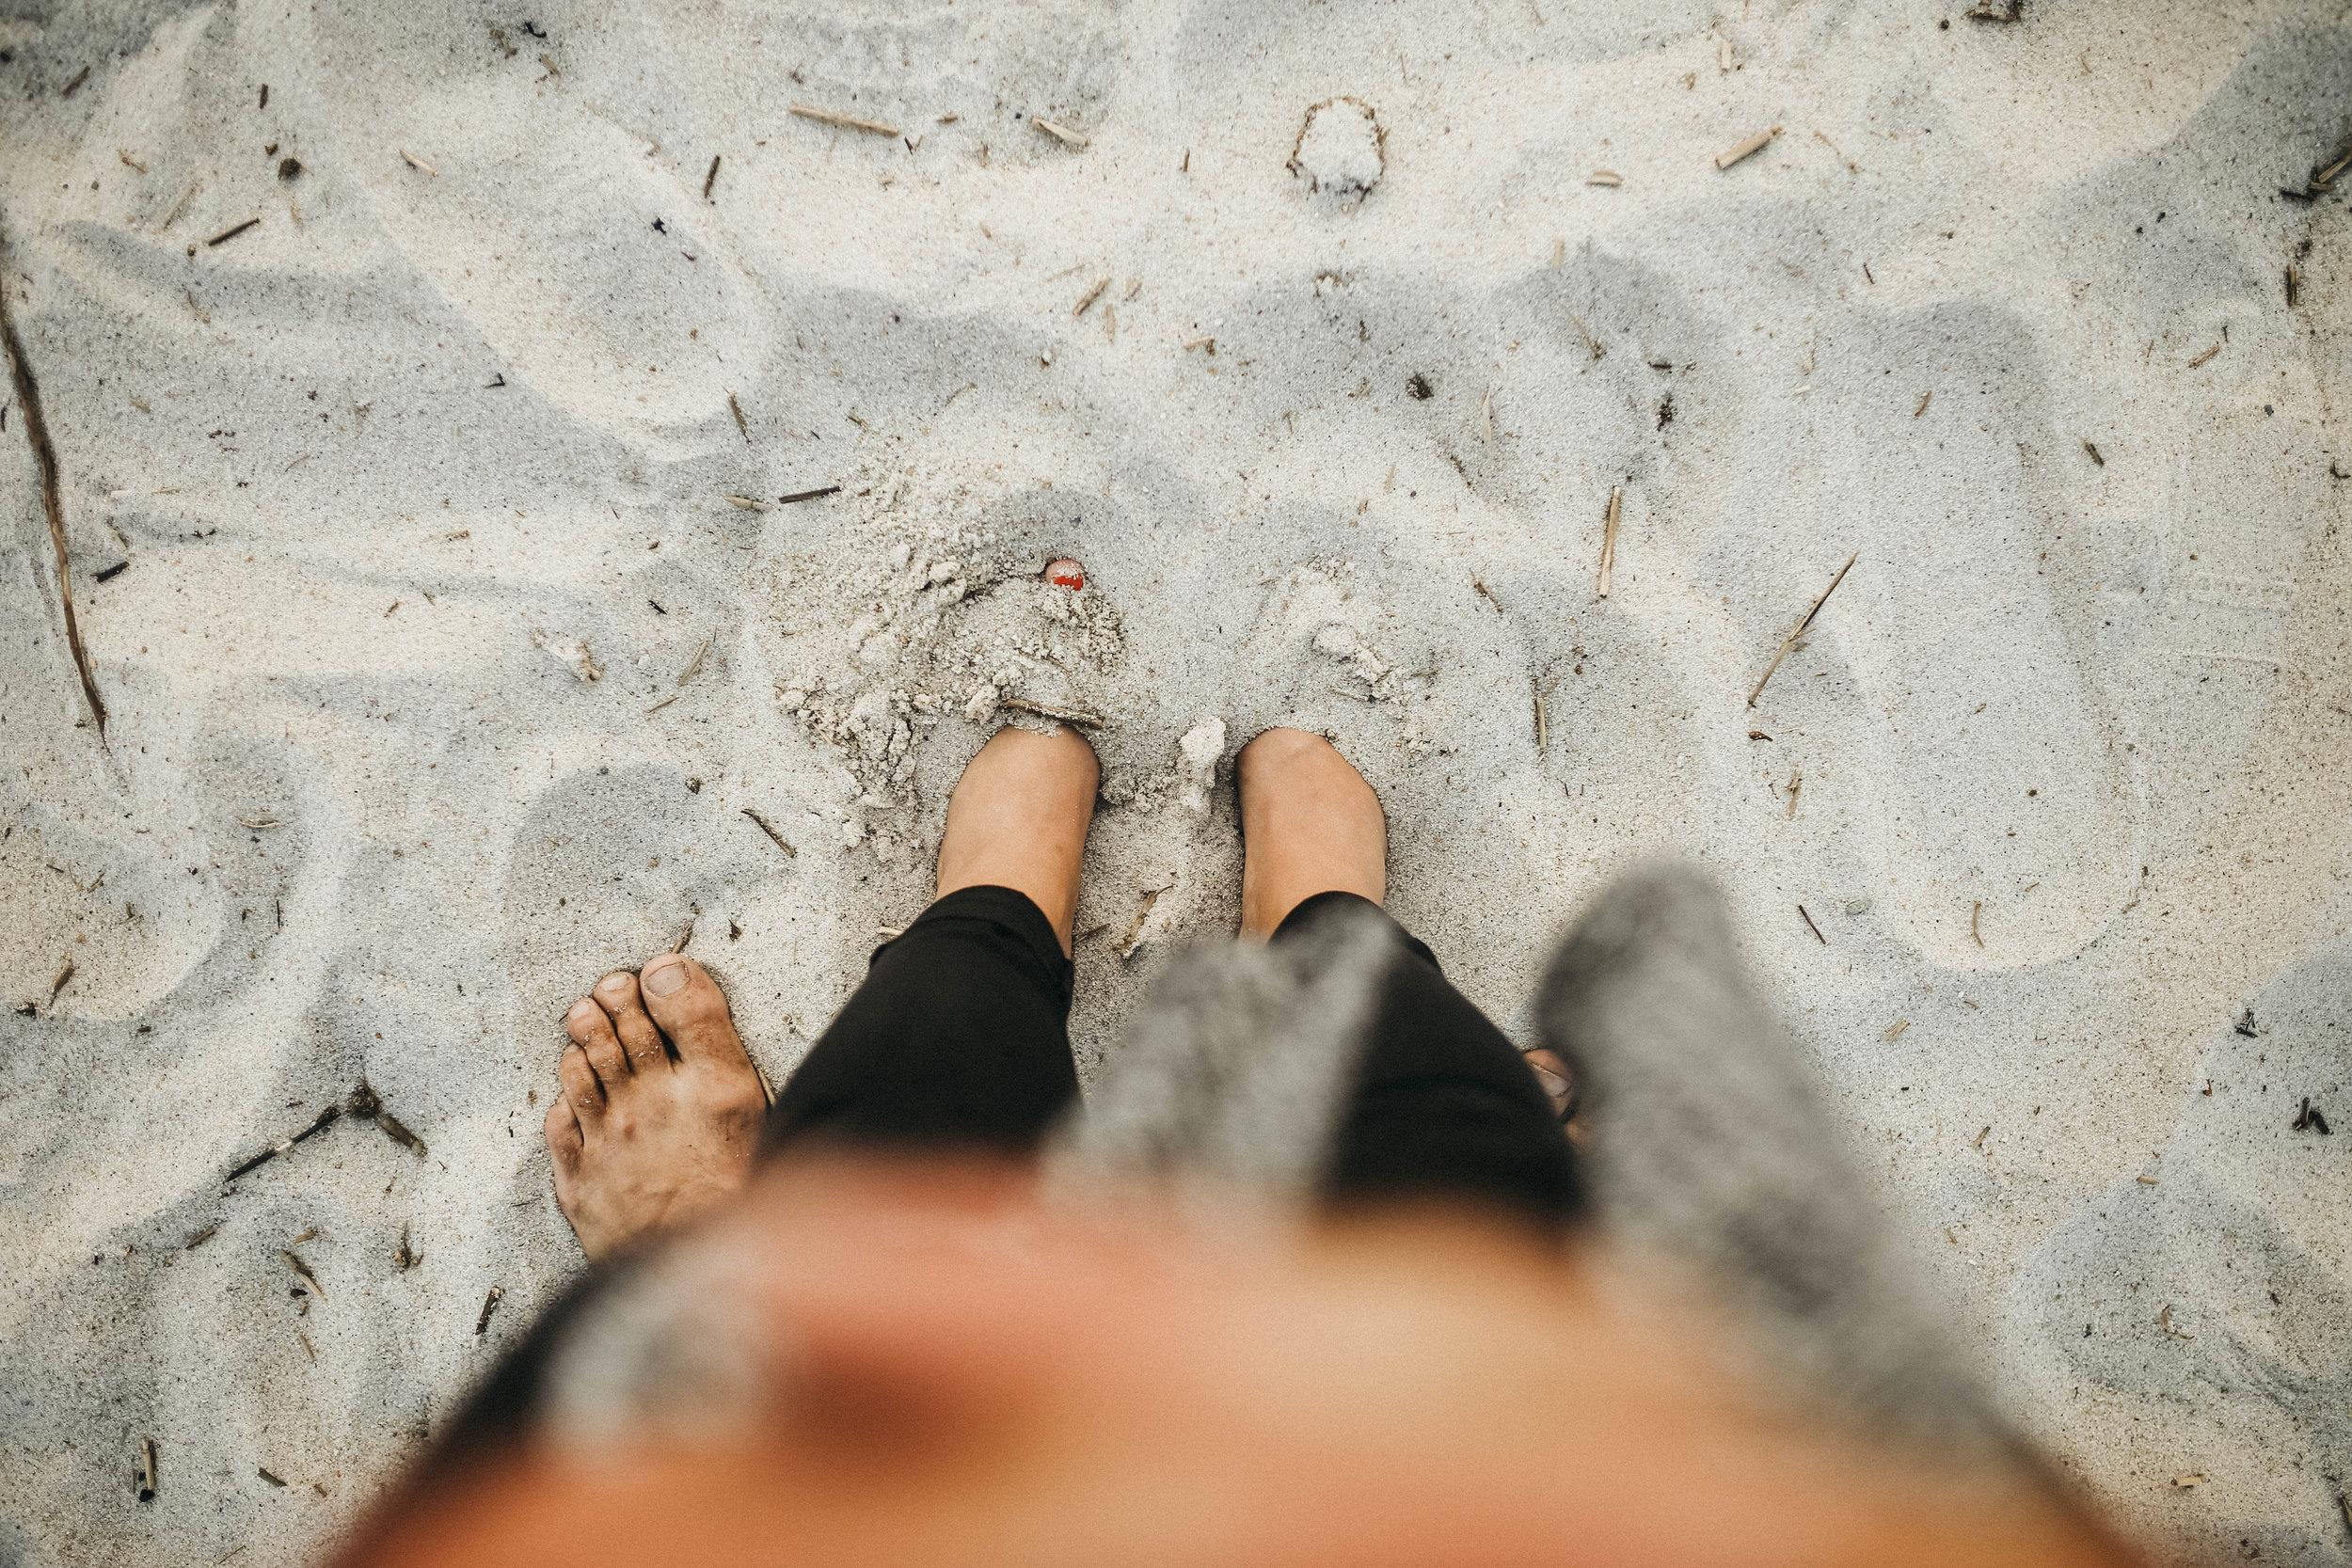 toes-in-sand.jpg